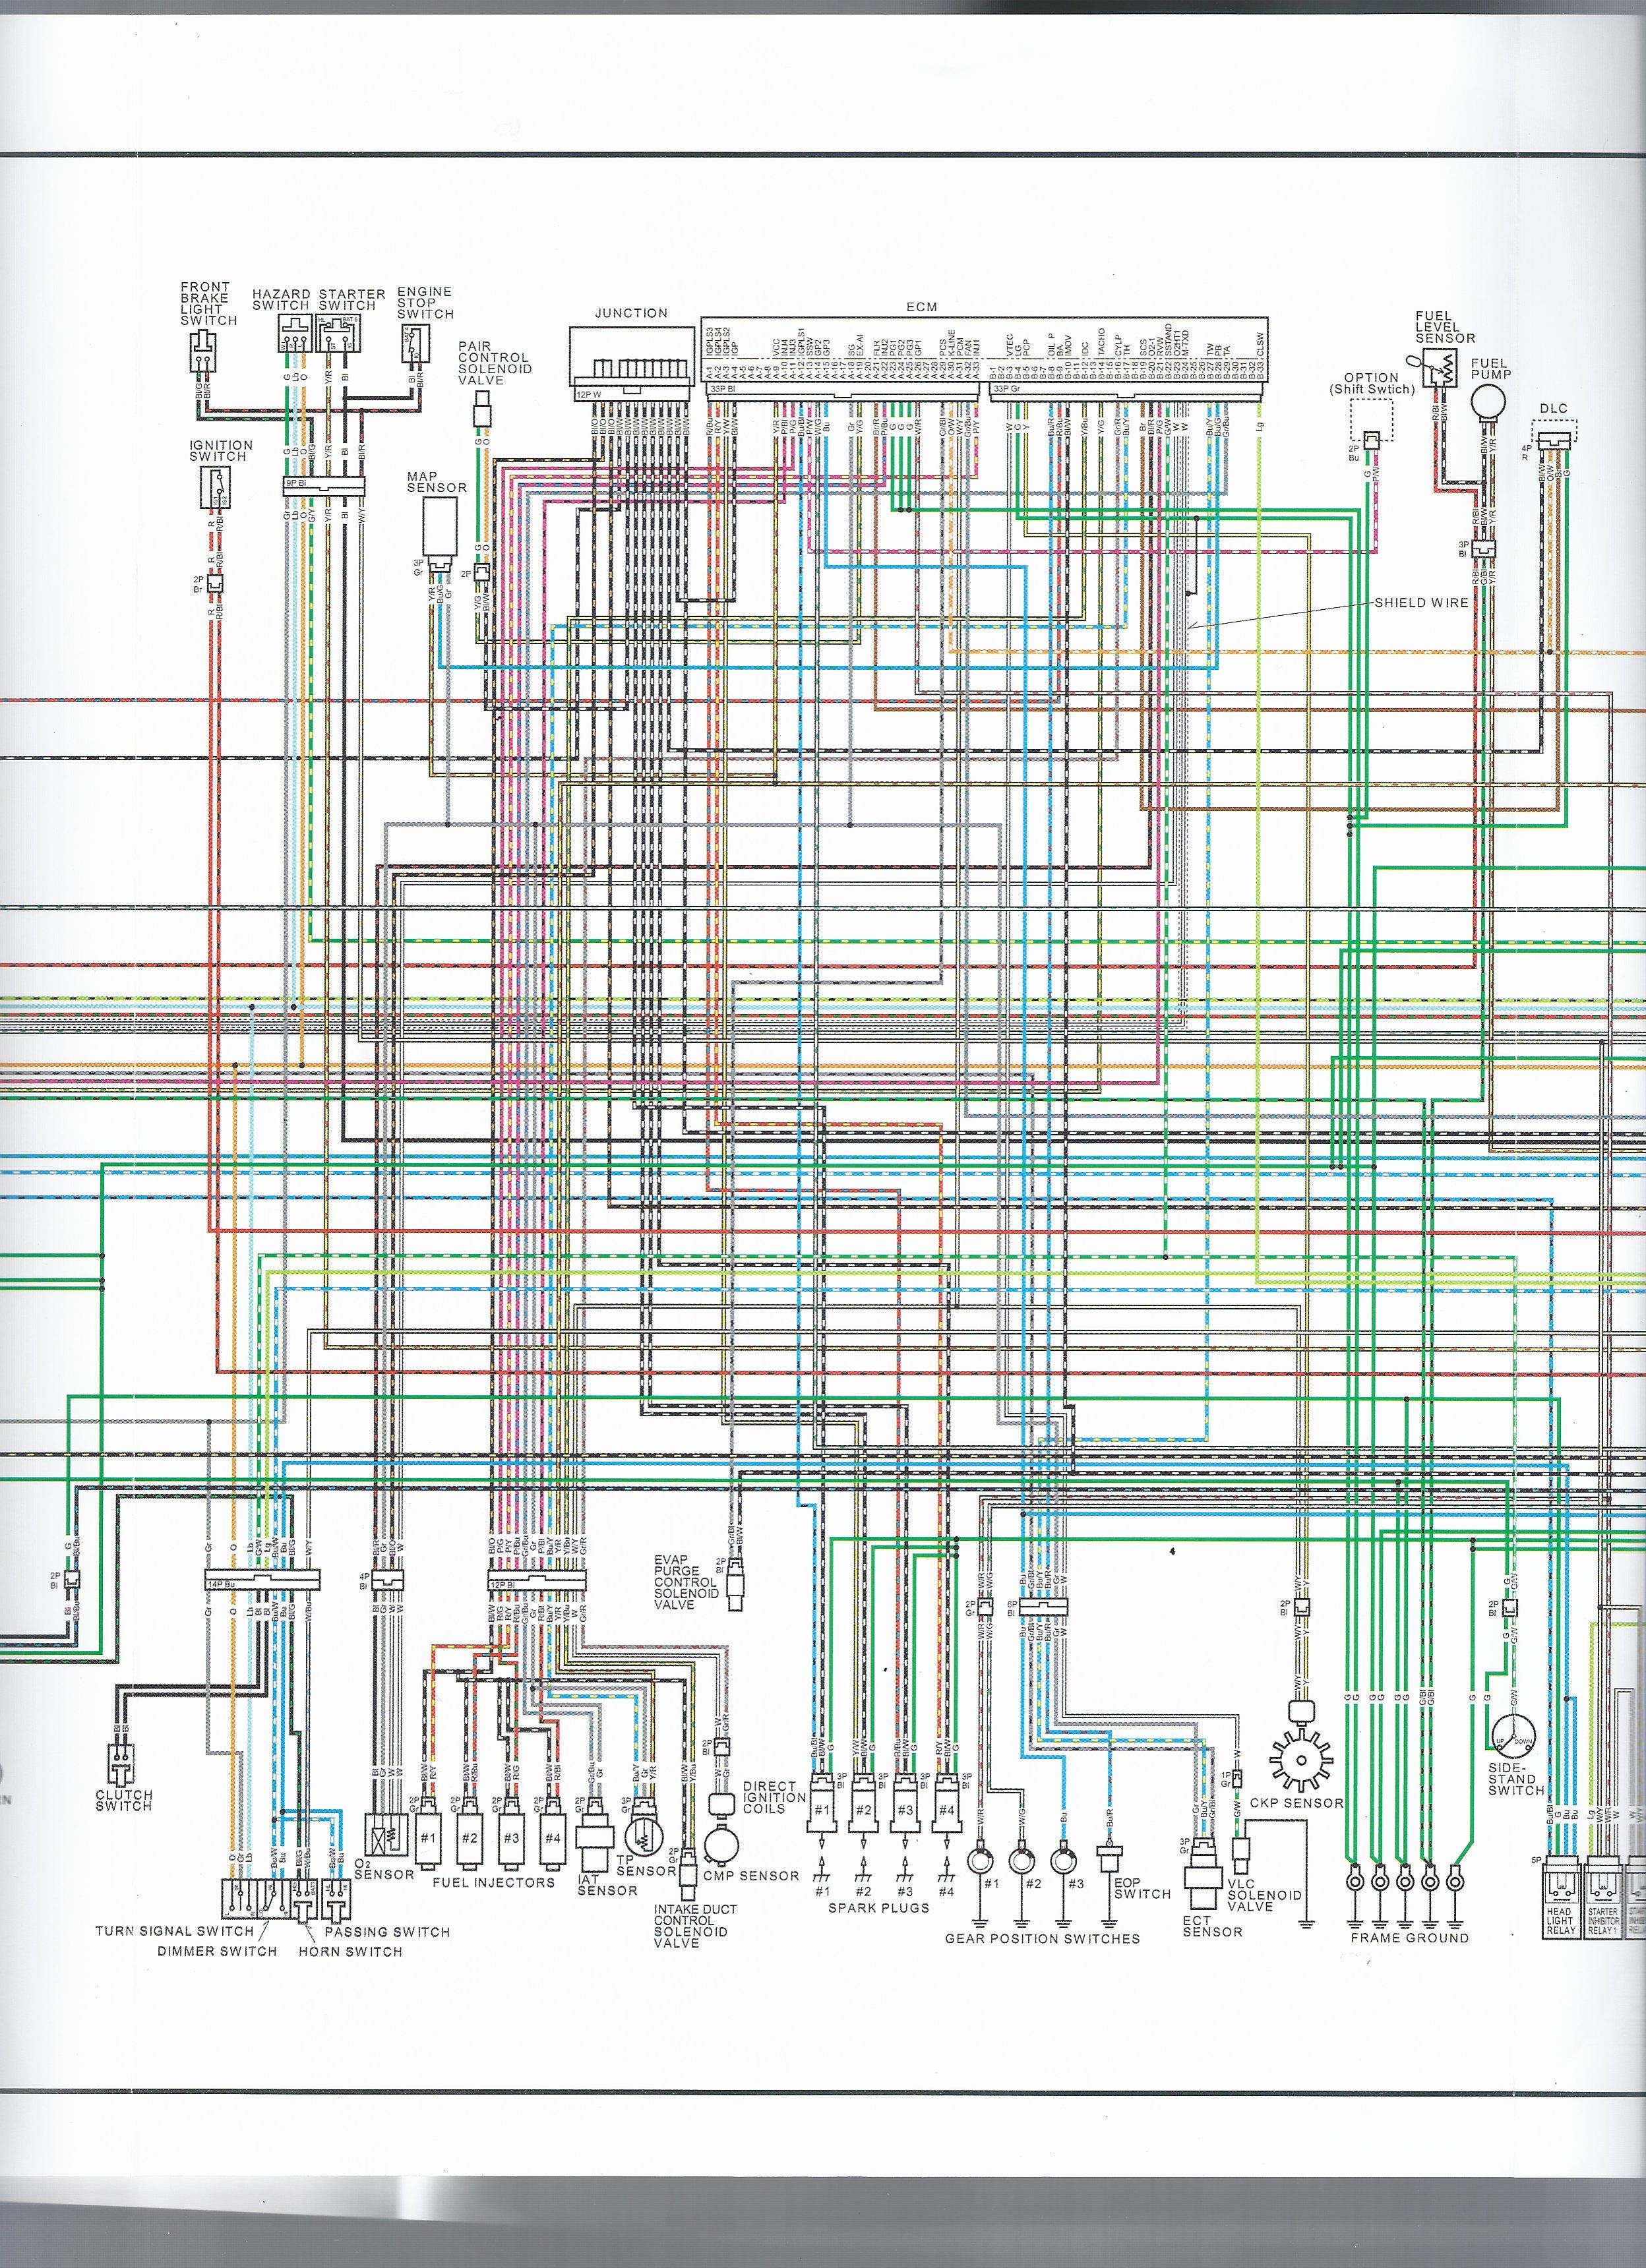 Wiring Diagram - Eighth Generation VFR\'s - VFRDiscussion